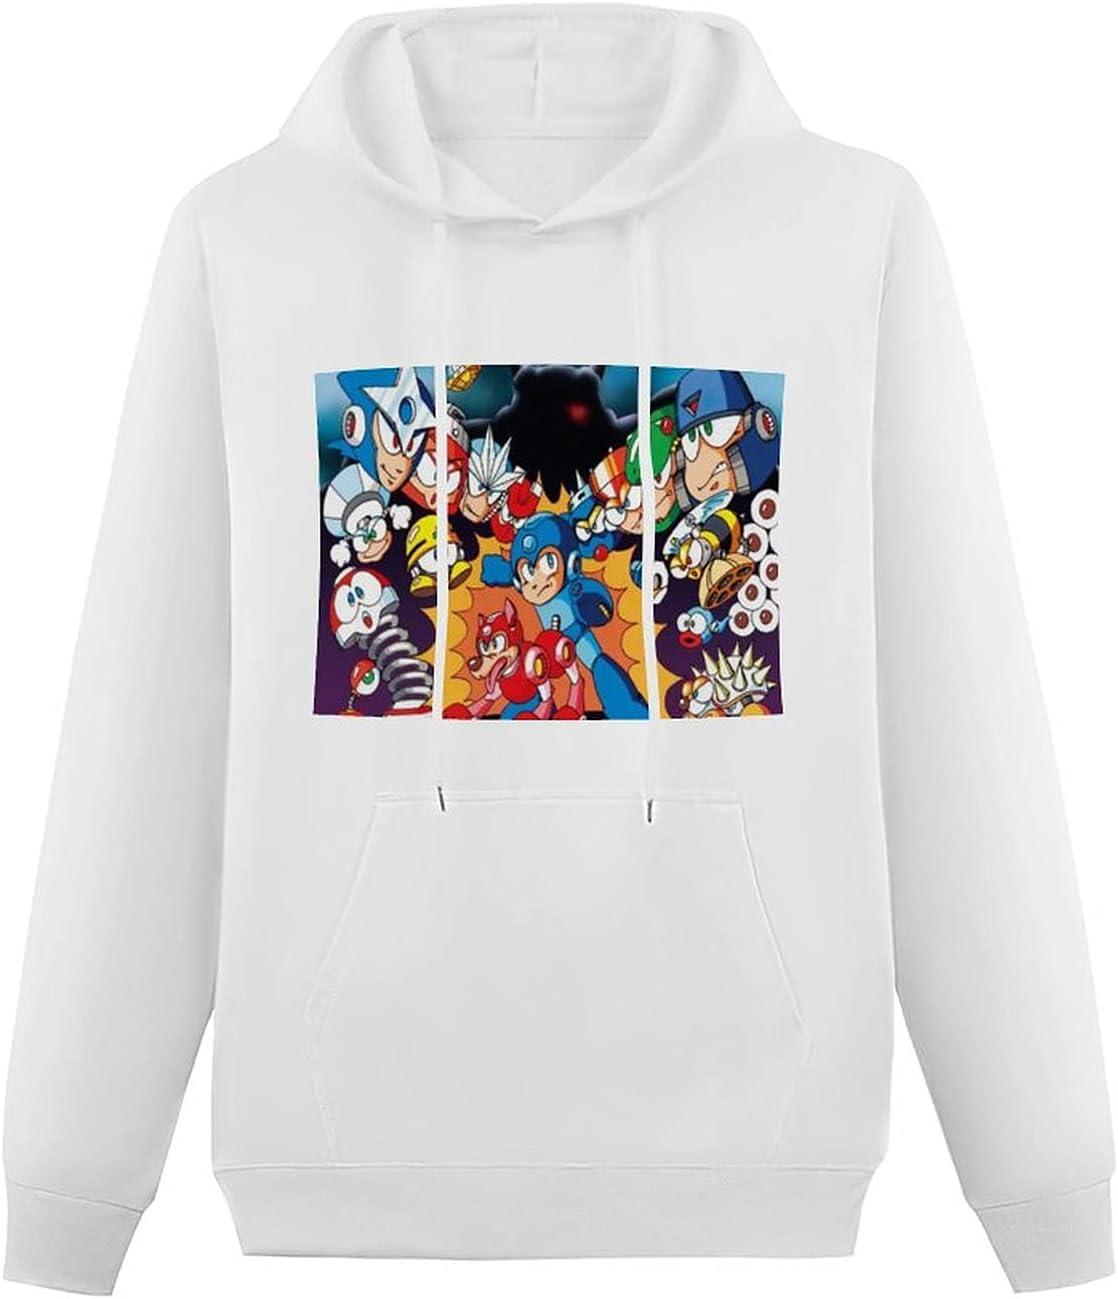 Centiza Mega-Man store Mega Man Boys New arrival and Swe Hoodie Girls Hooded Teens